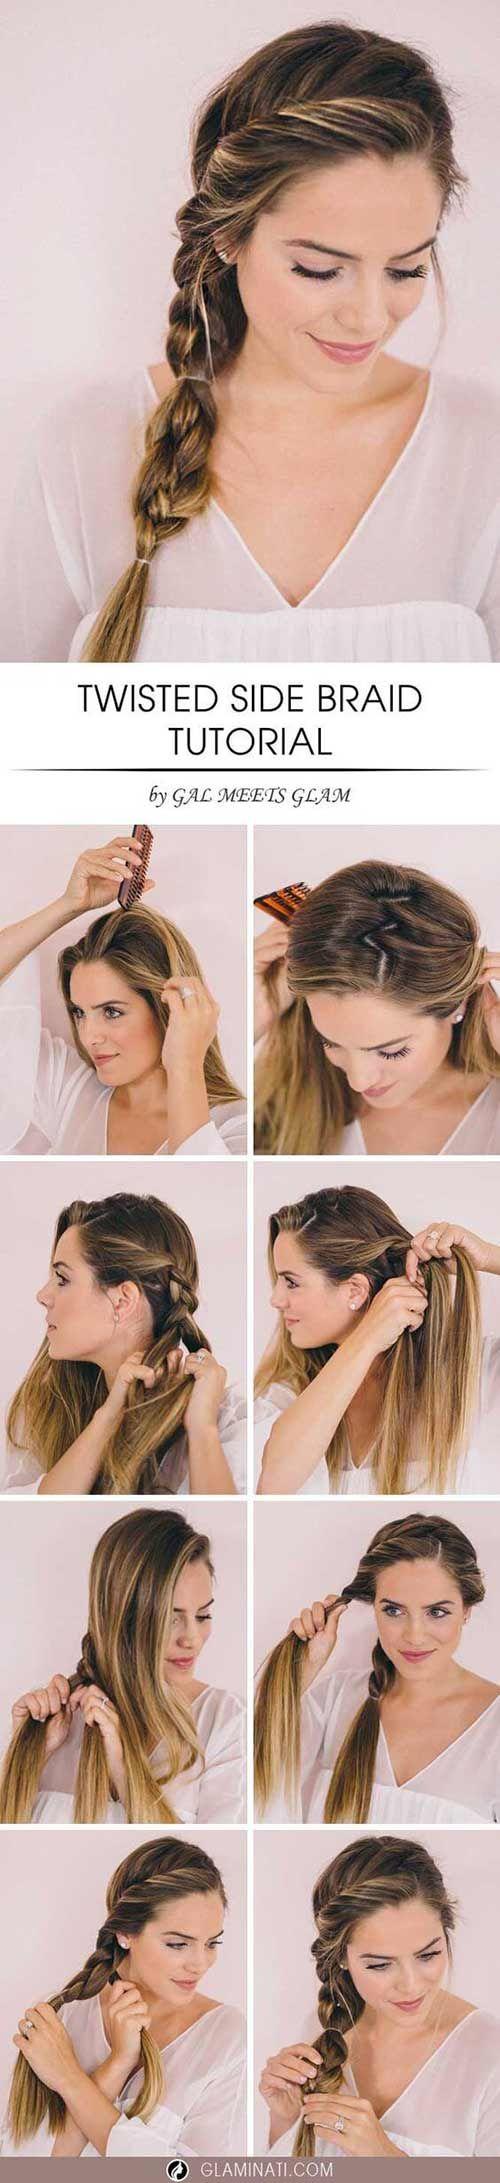 12 Tolle Frisuren Für Mädchen Langhaar Frisuren - Kurzhaarfrisuren #girlhairstyles